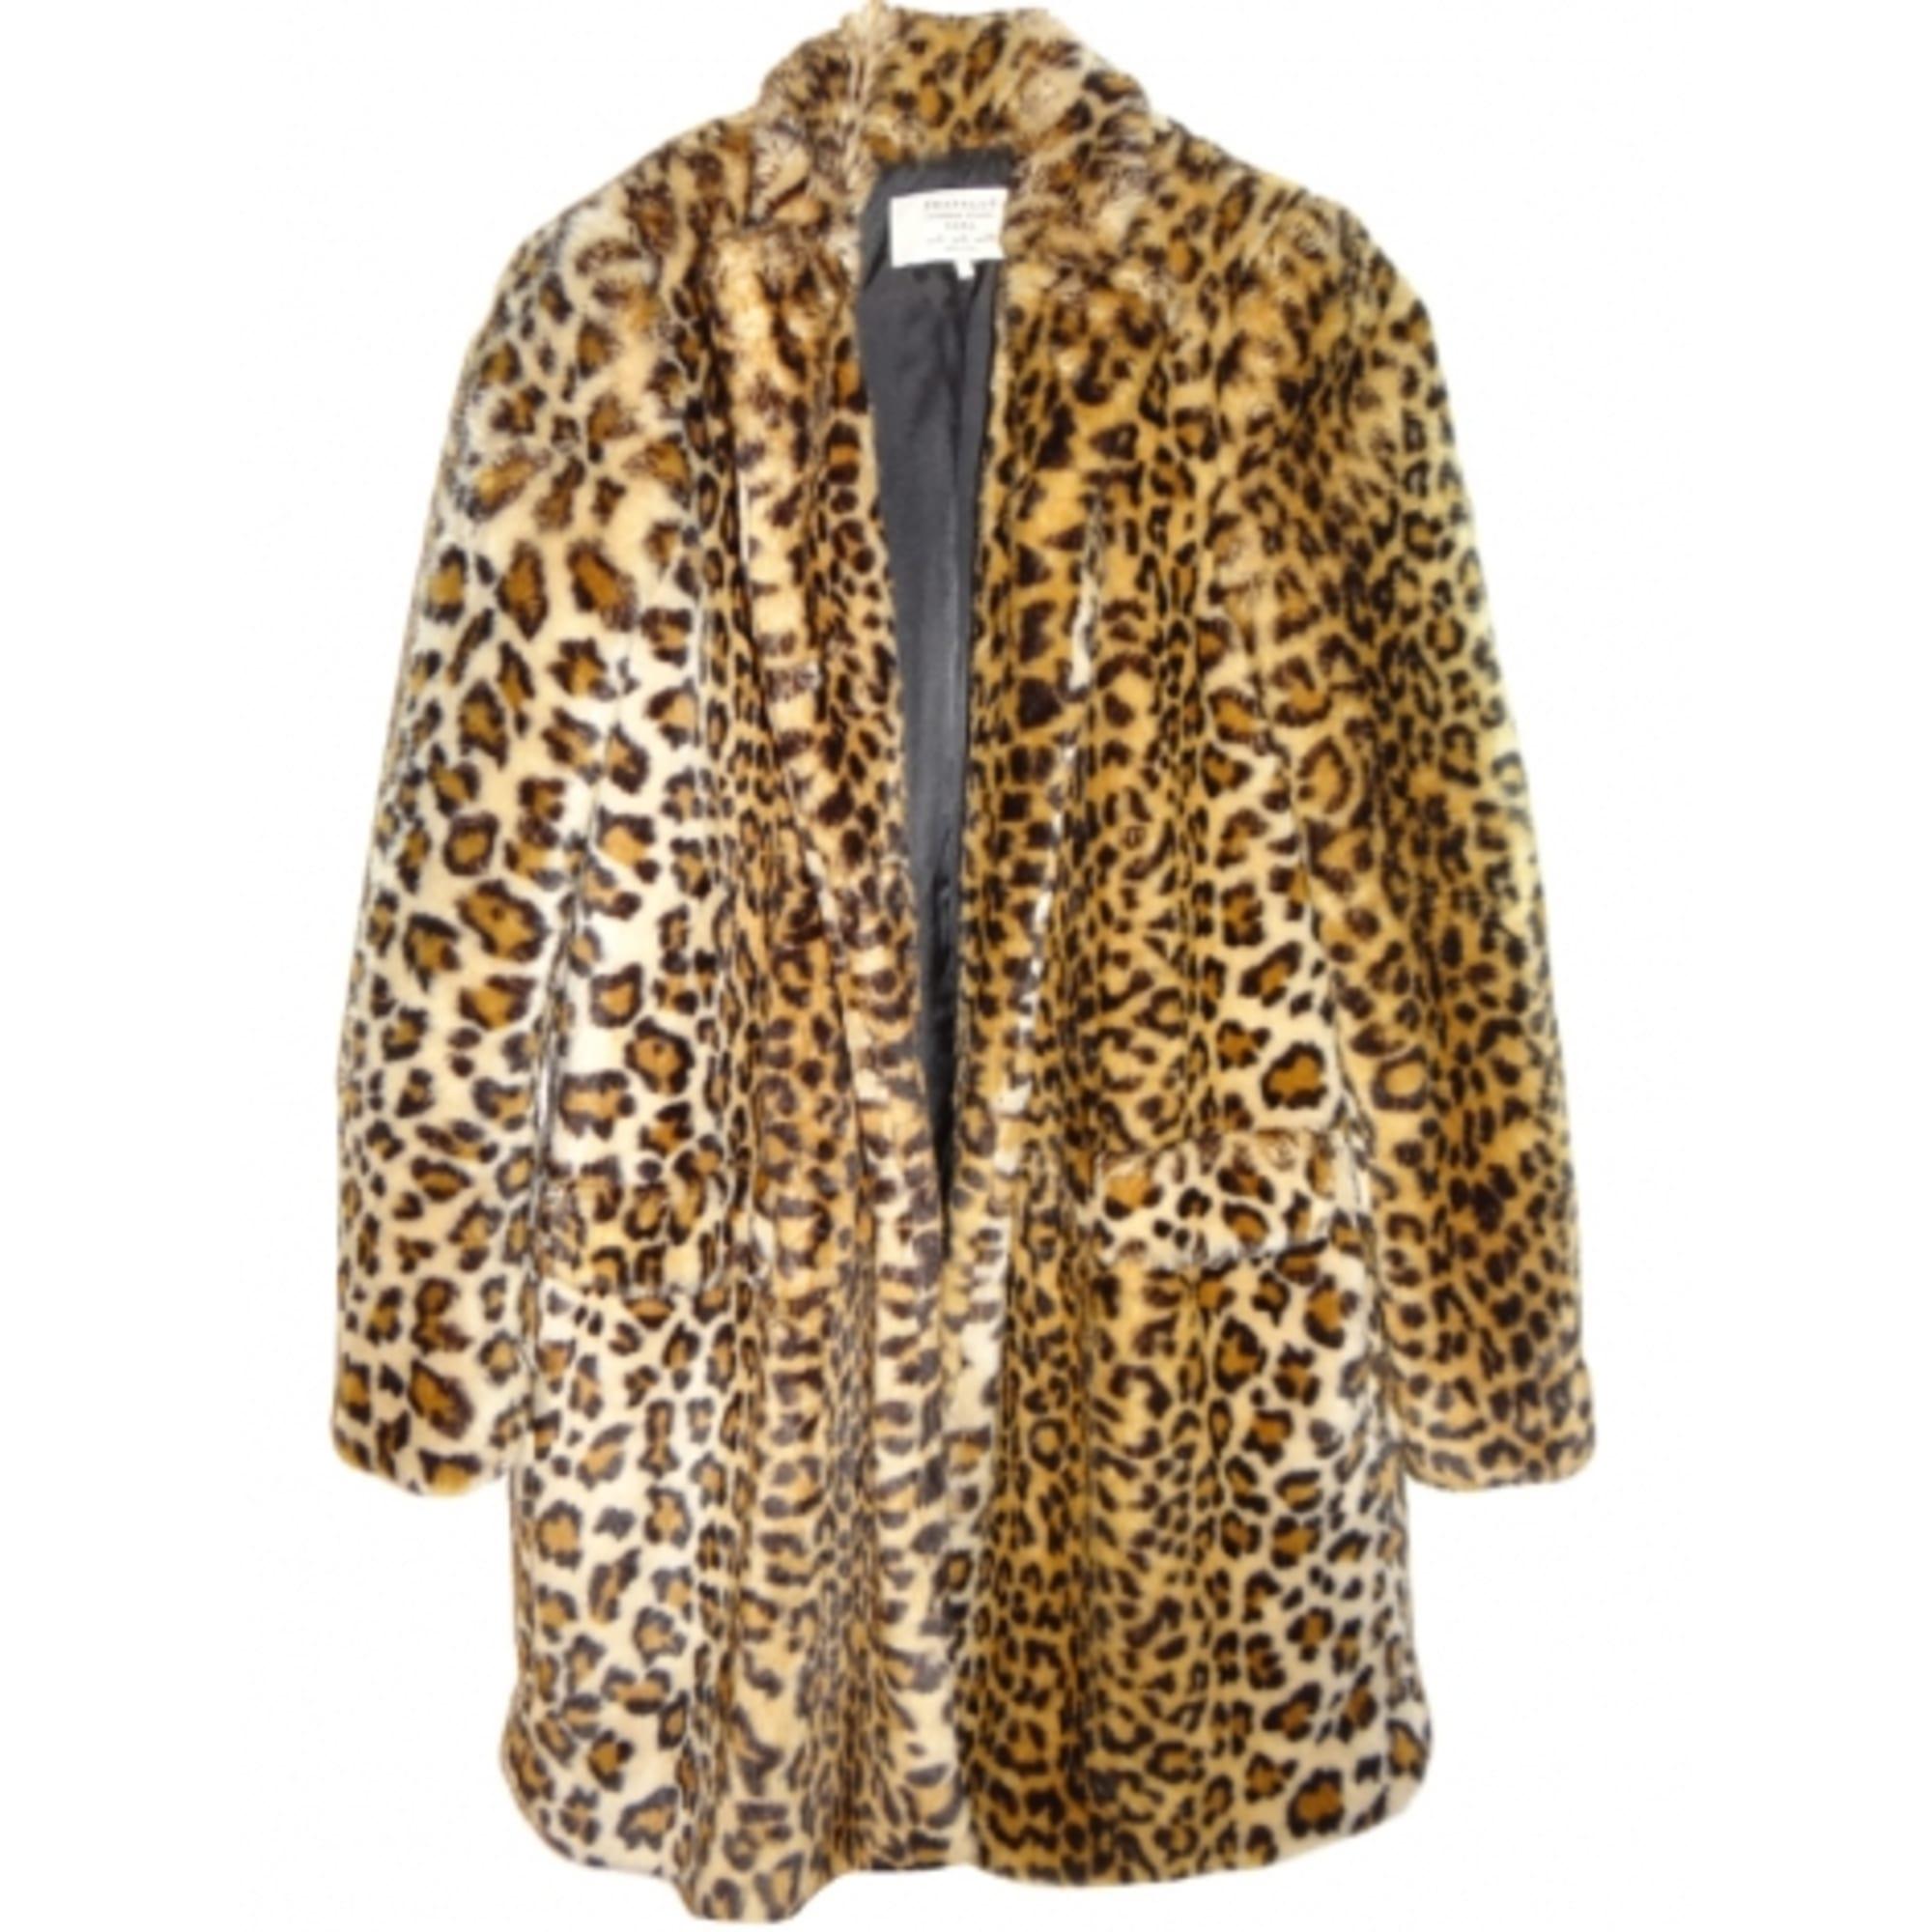 Manteau Leopard Zara d'occasion